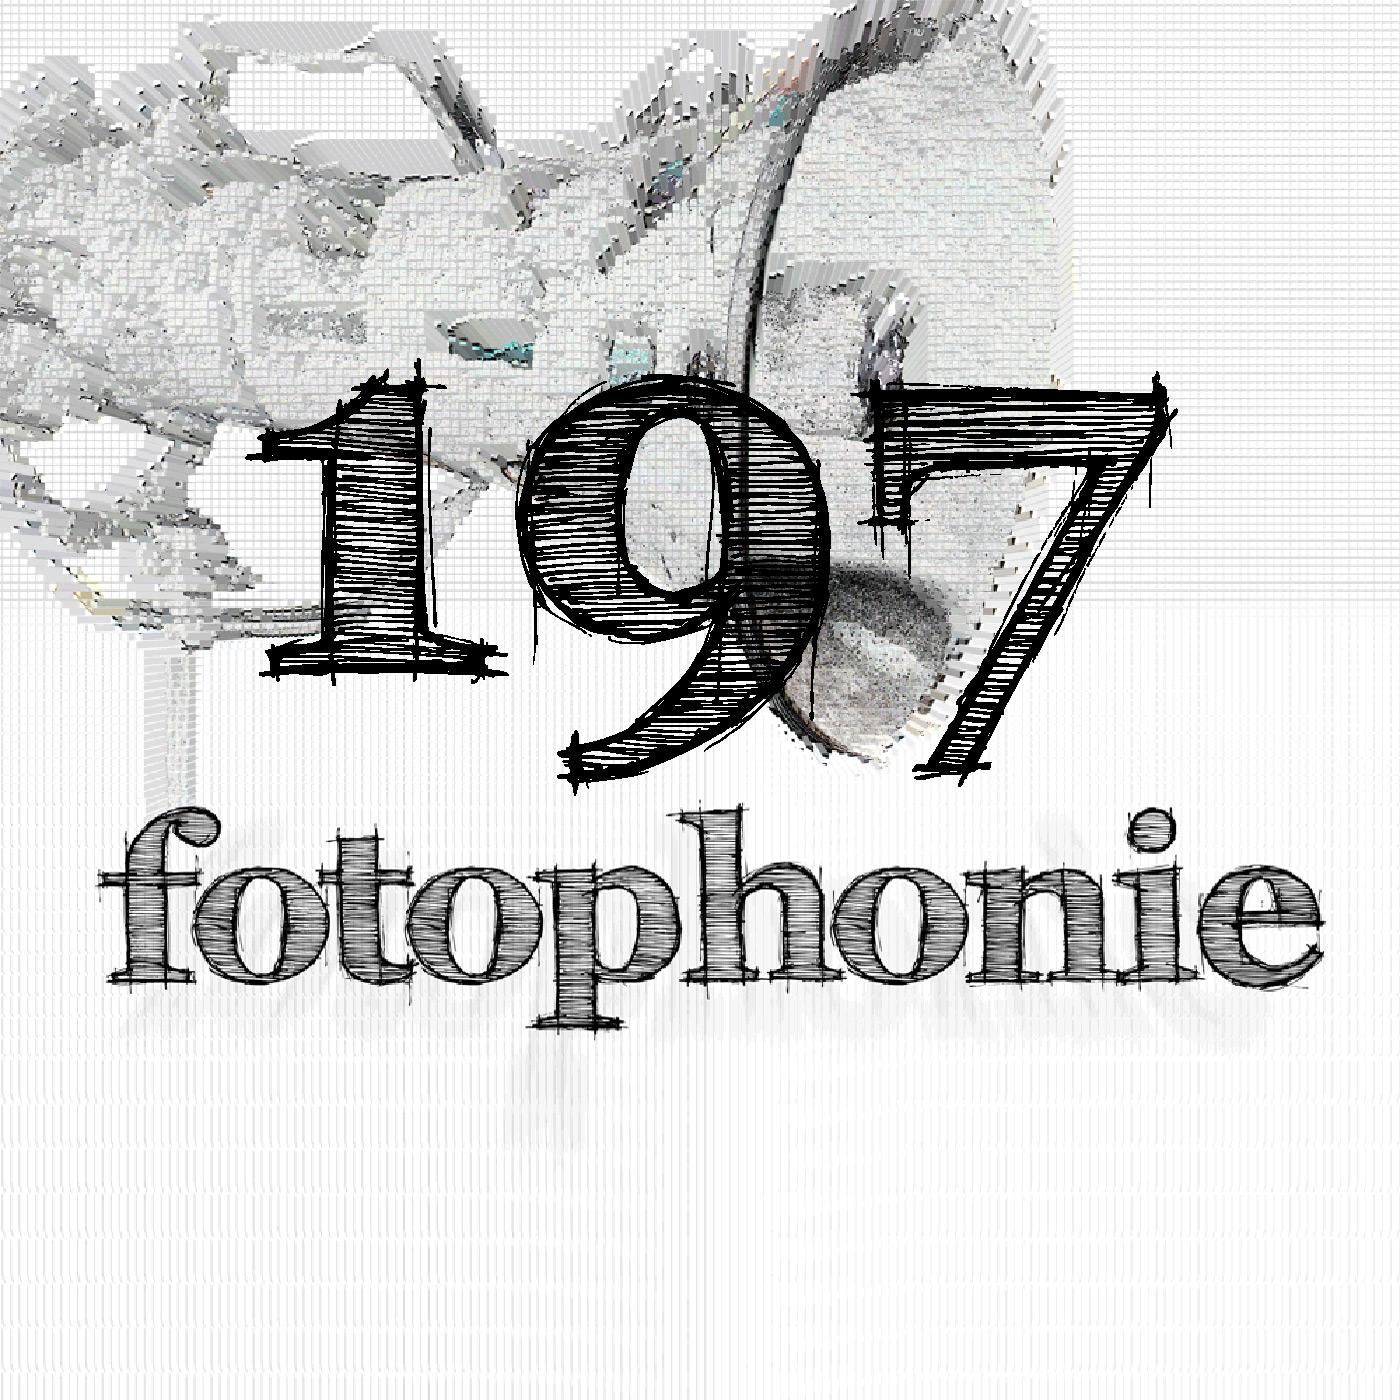 fotophonie 197 – Plattfuß im Kaukasus